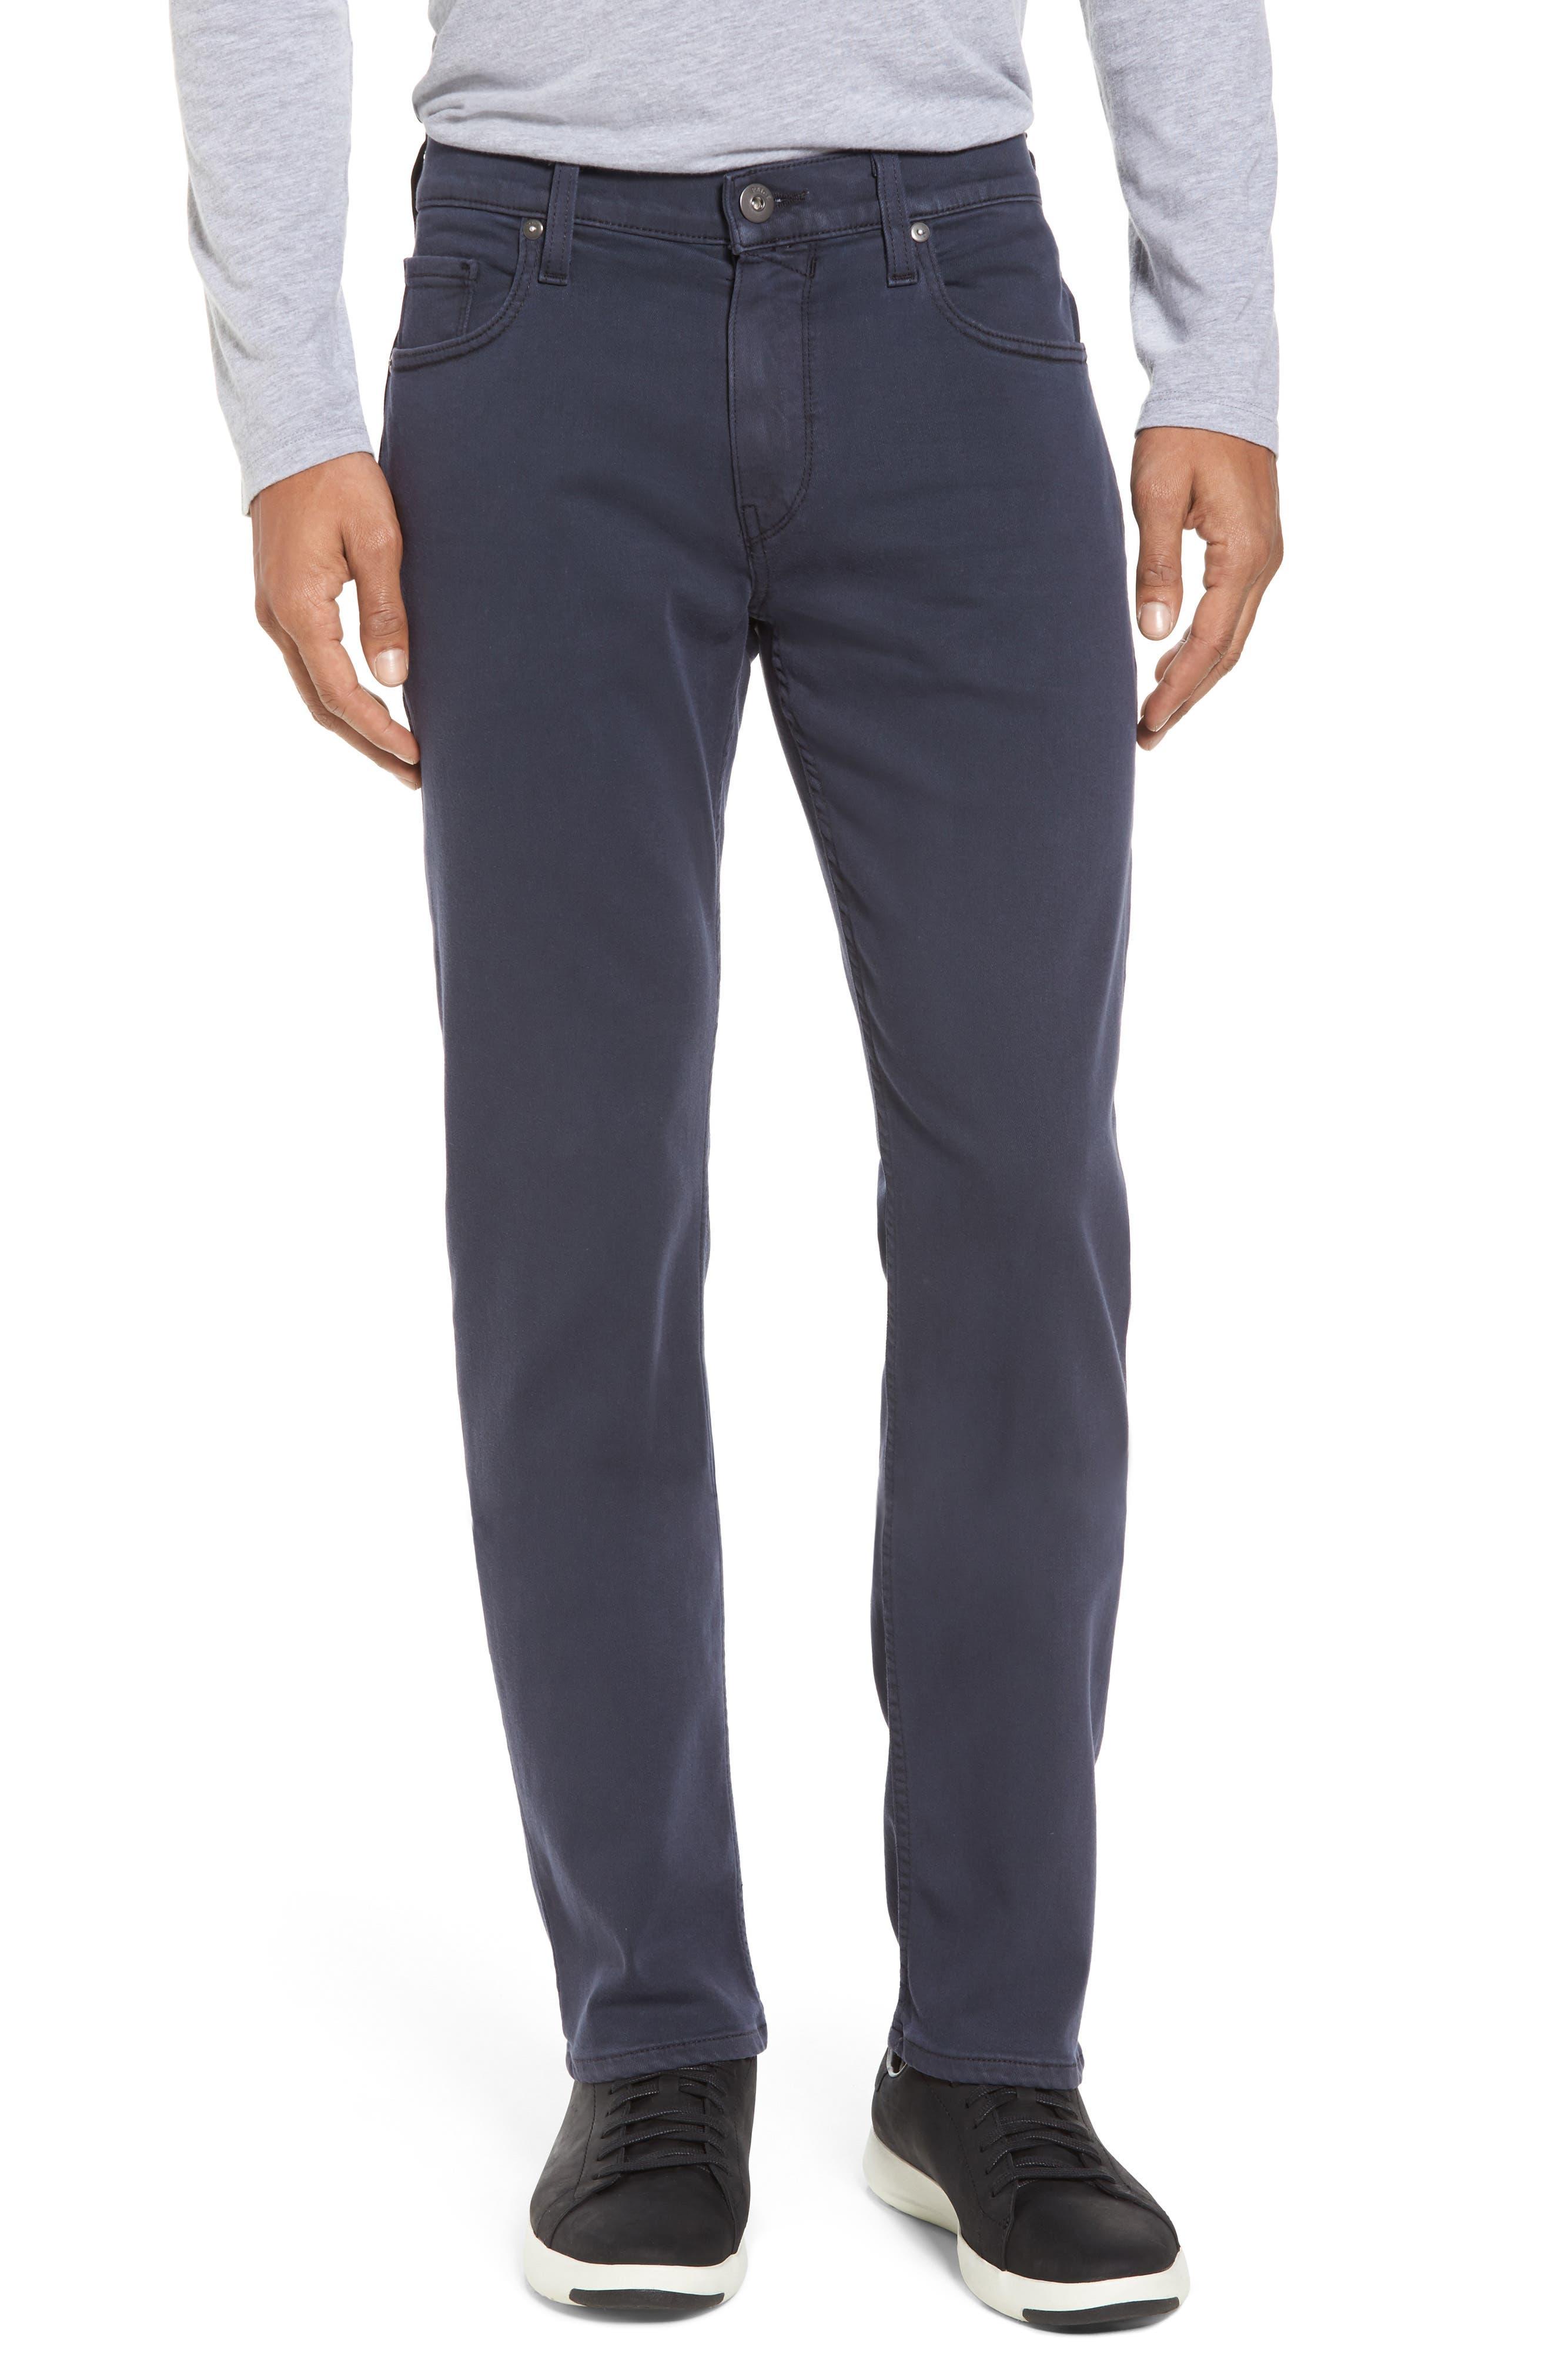 Alternate Image 1 Selected - PAIGE Transcend - Federal Slim Straight Leg Jeans (Vintage Deep Sea)